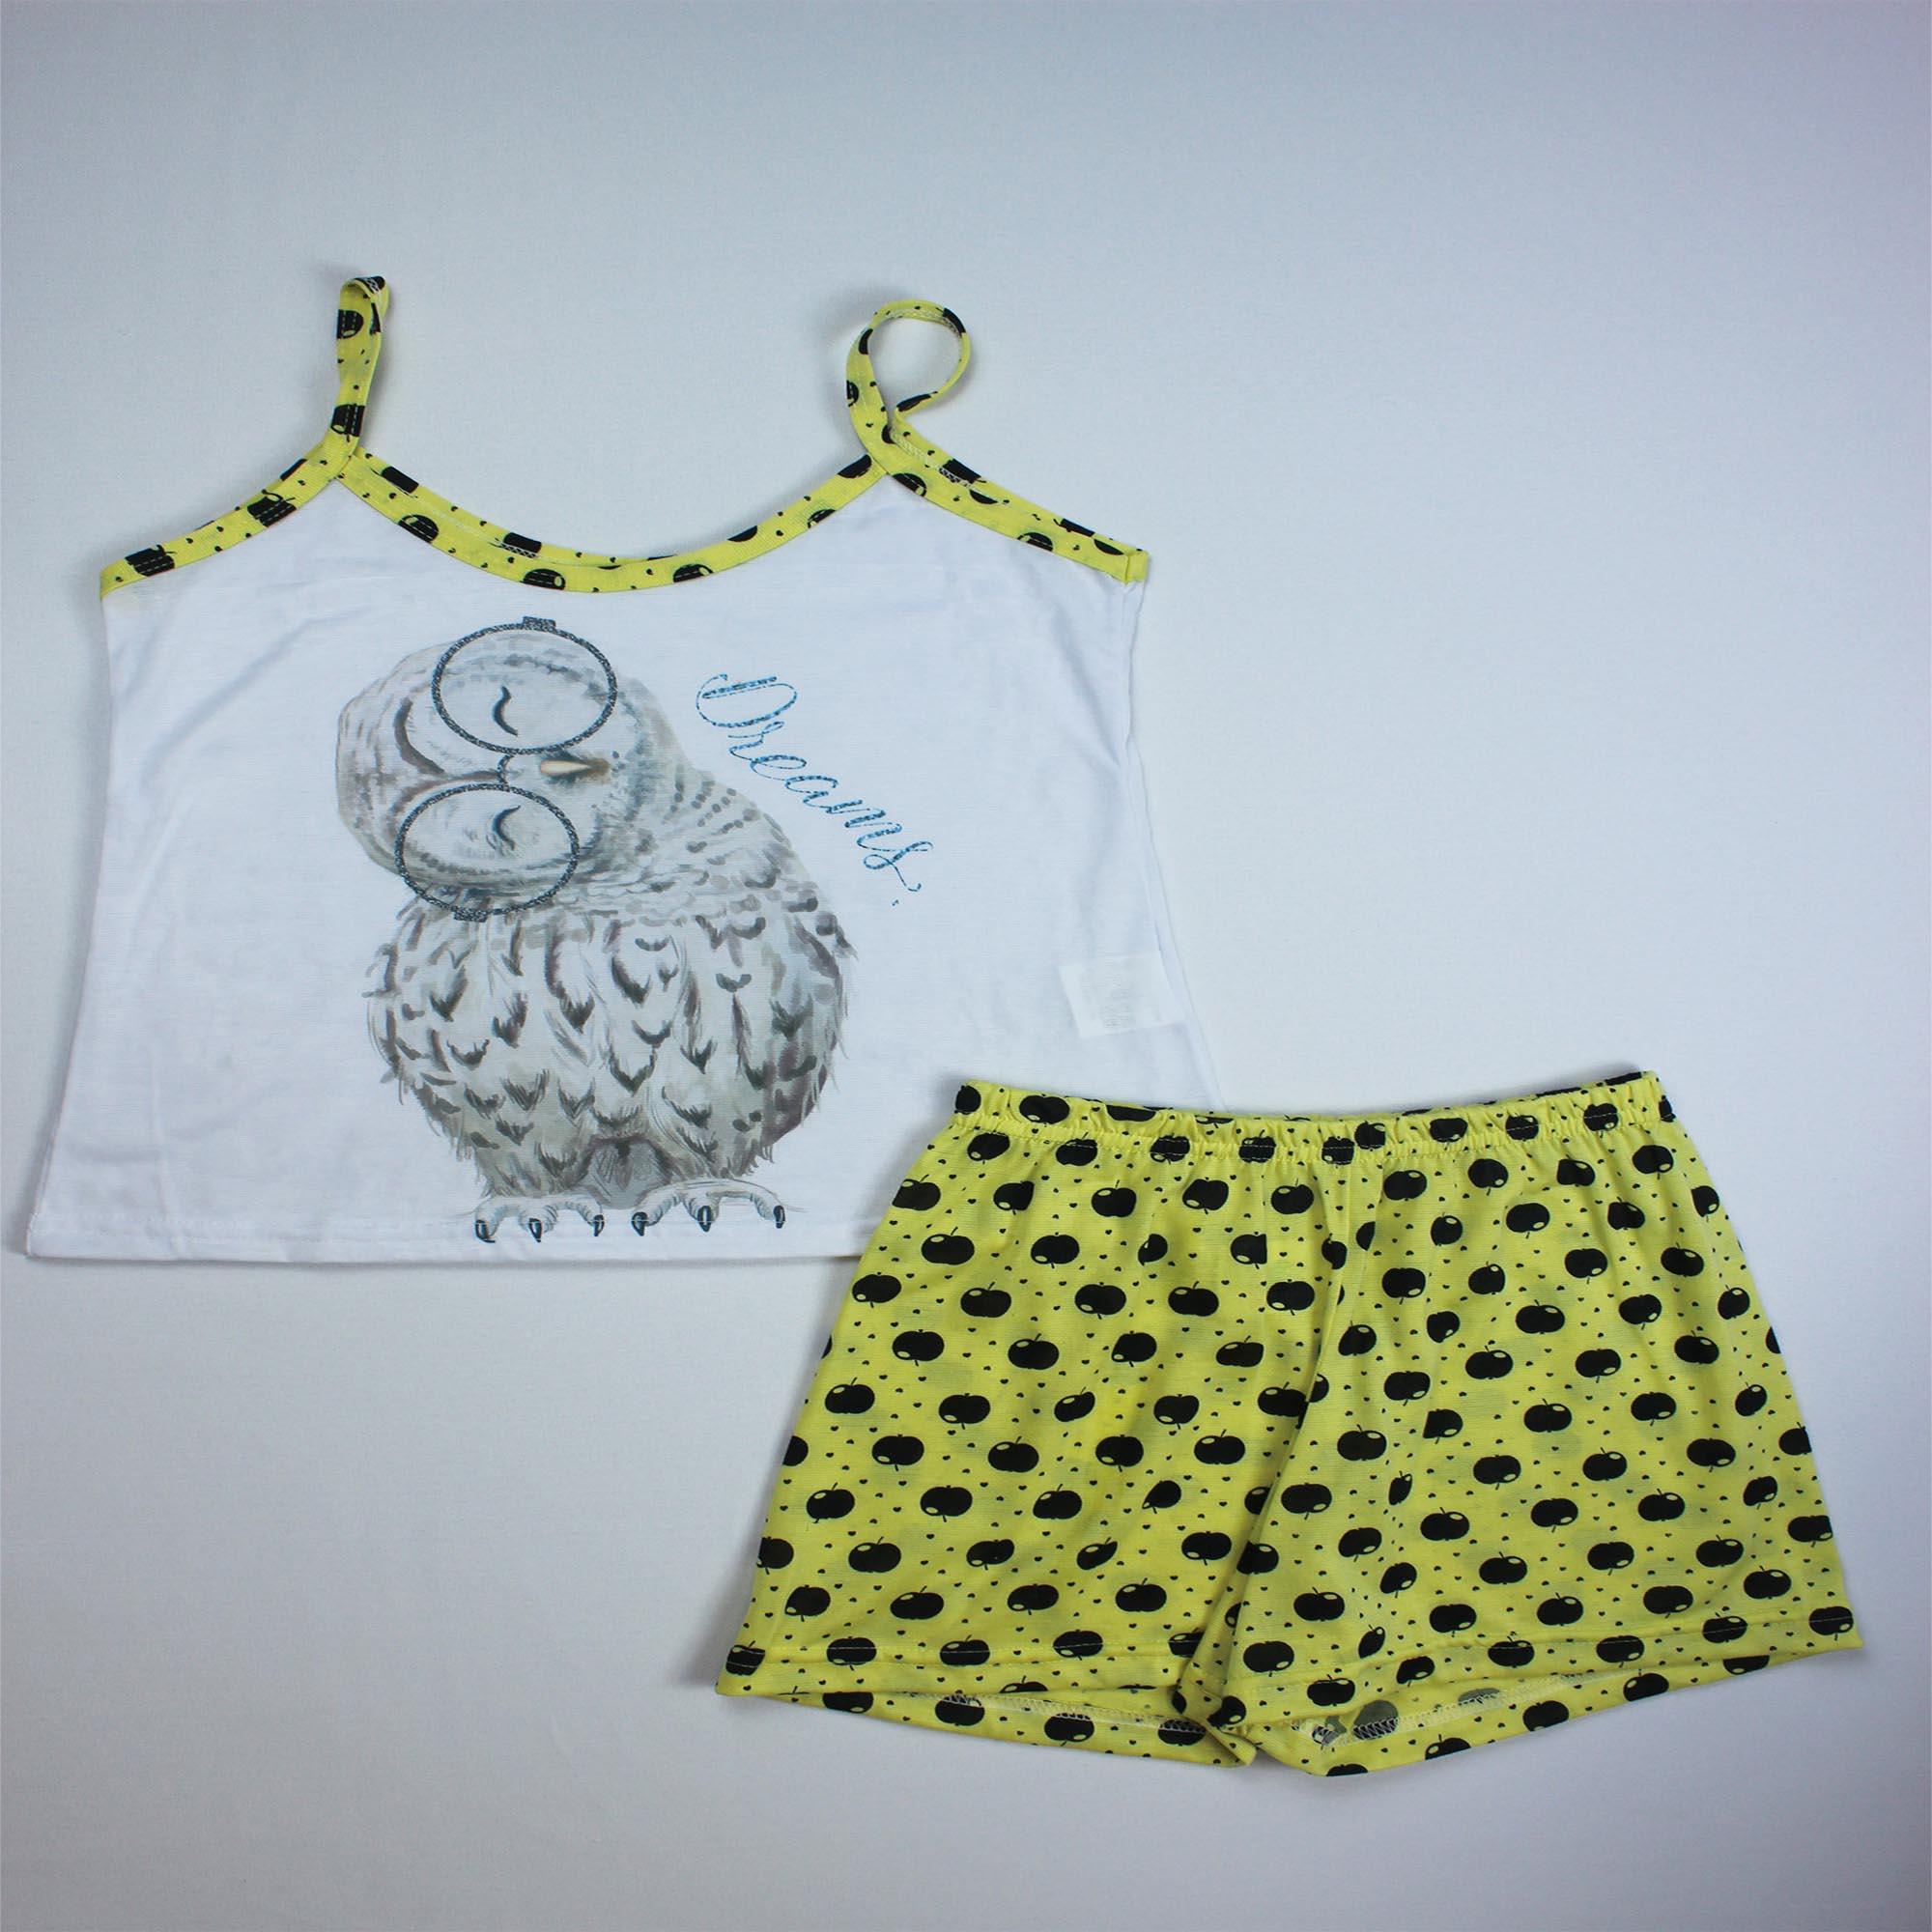 Pijama Regata Infantil Menina - Tamanho 12